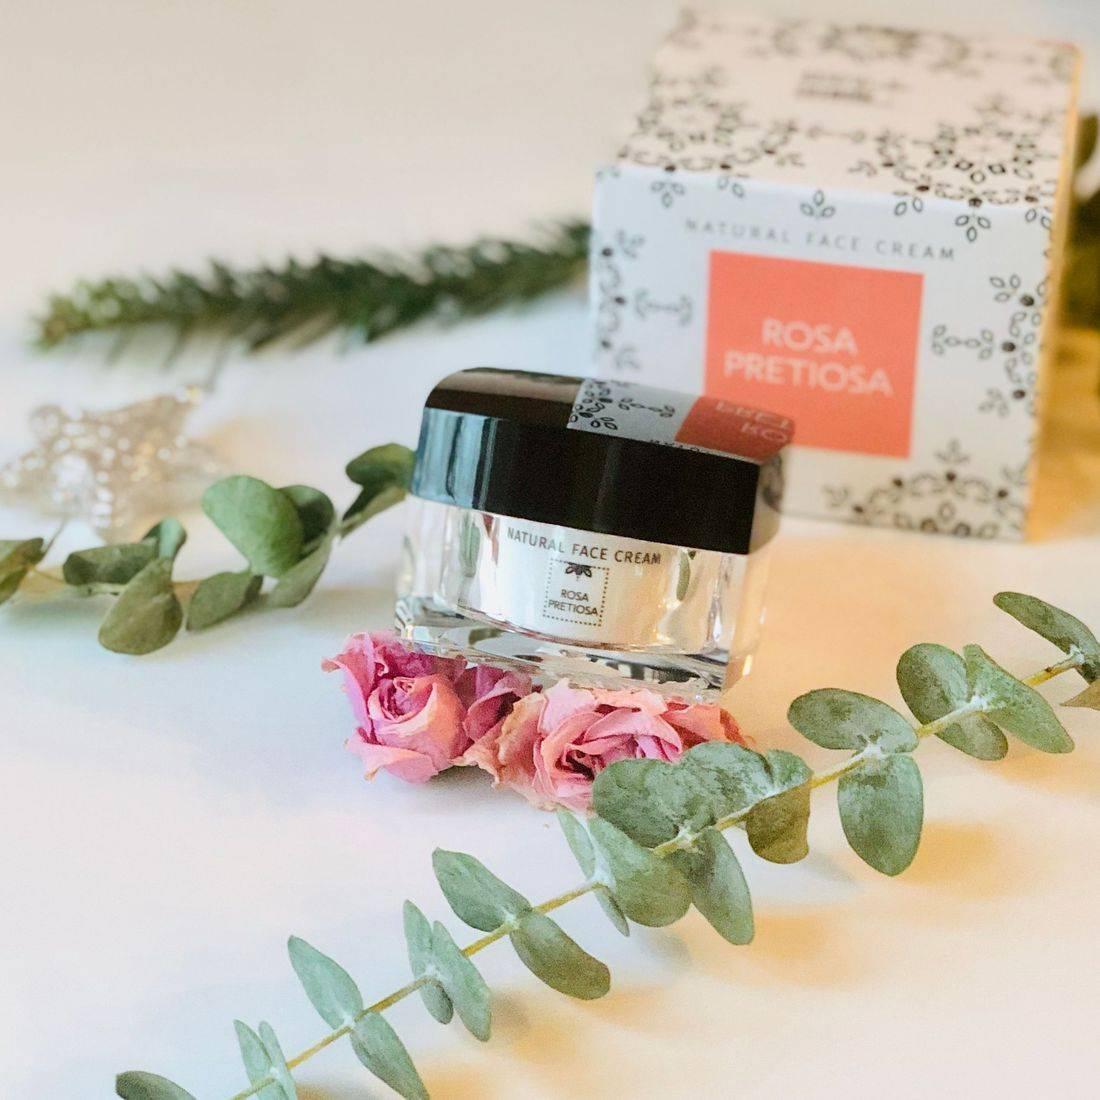 rosa pretiosa face cream, rose face cream, best rose-infused skincare, rose beauty, clean beauty, rosepostbox